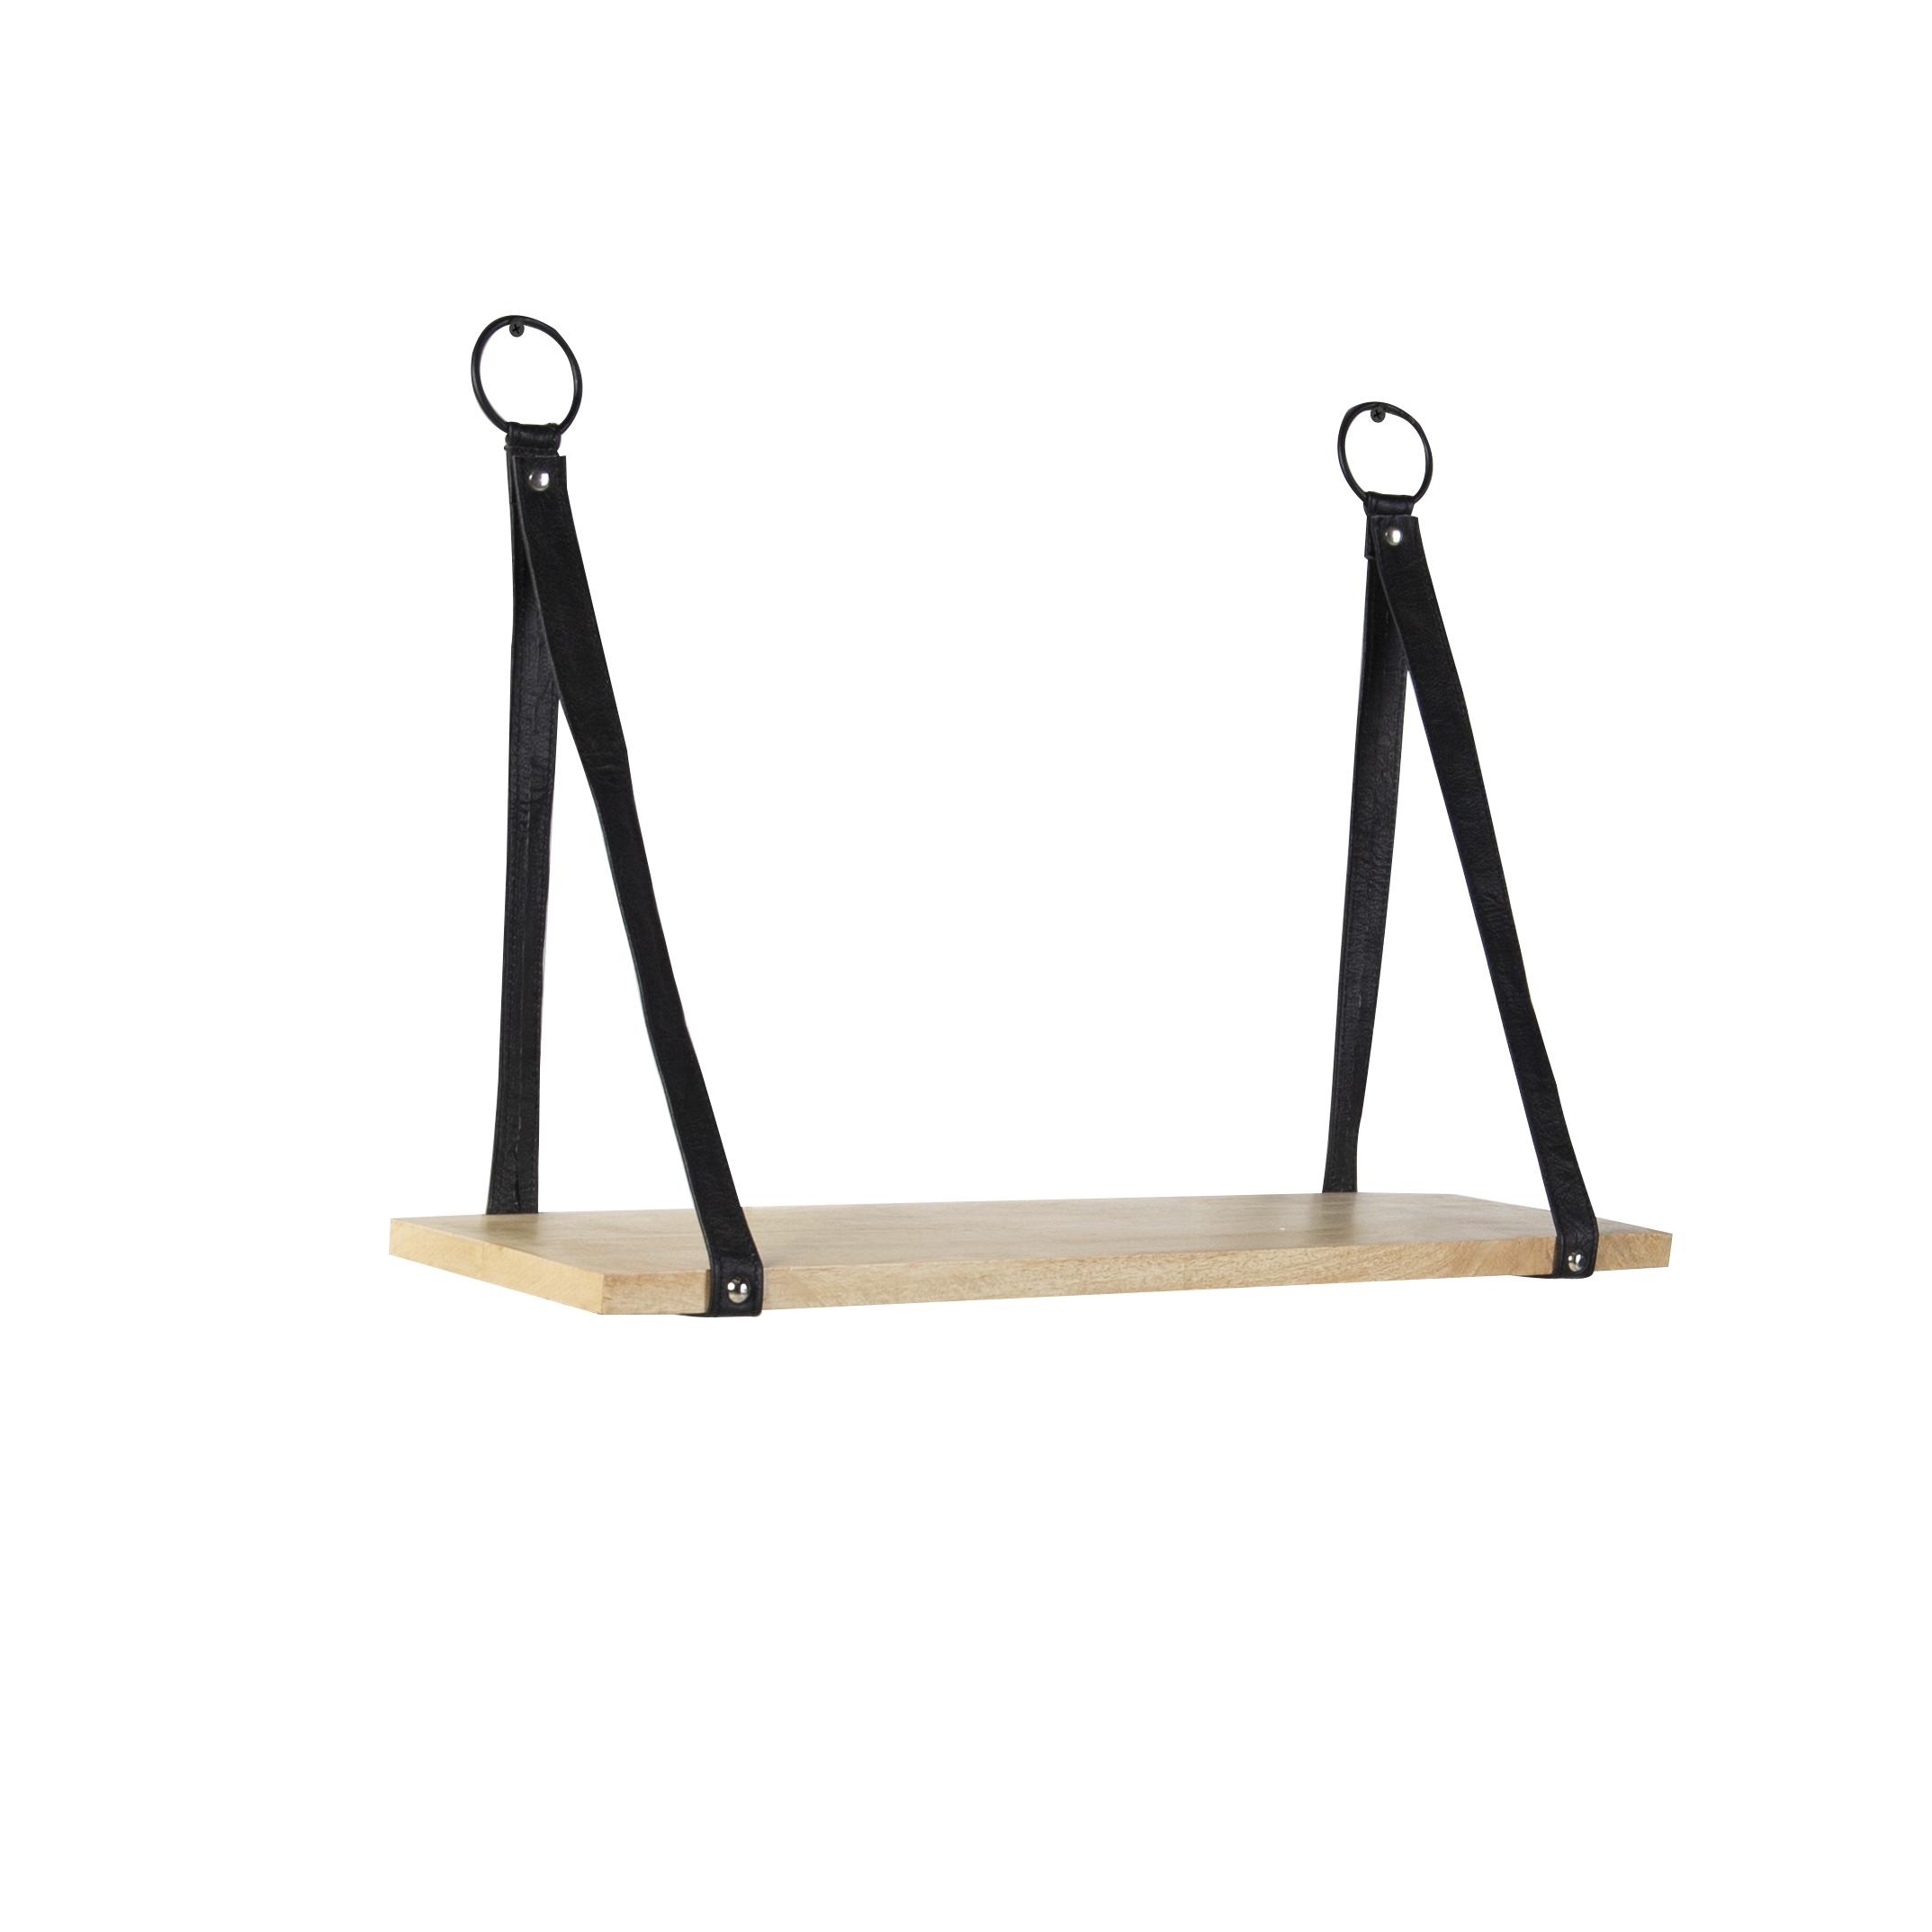 Industrieel wandrek met 1 houten plank en zwarte lederen riemen - Swing